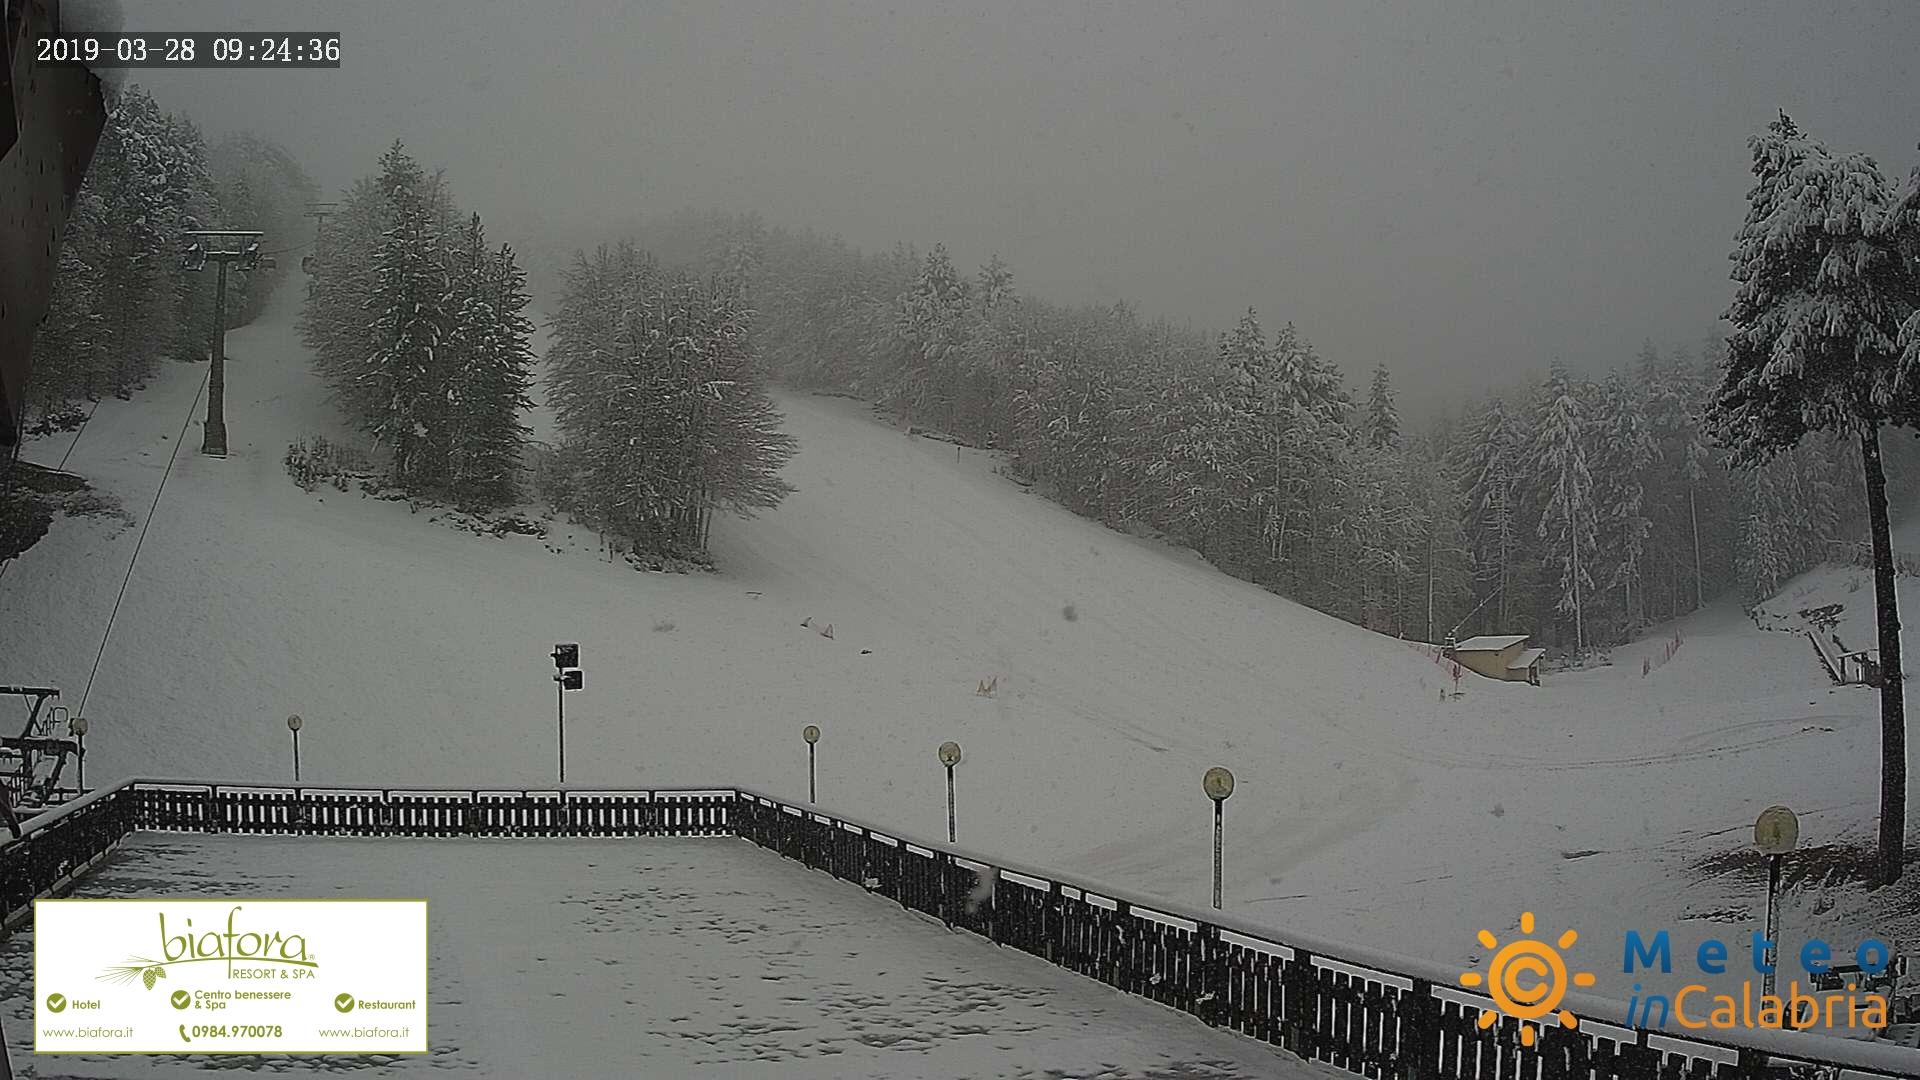 nevicate su Sila e Pollino